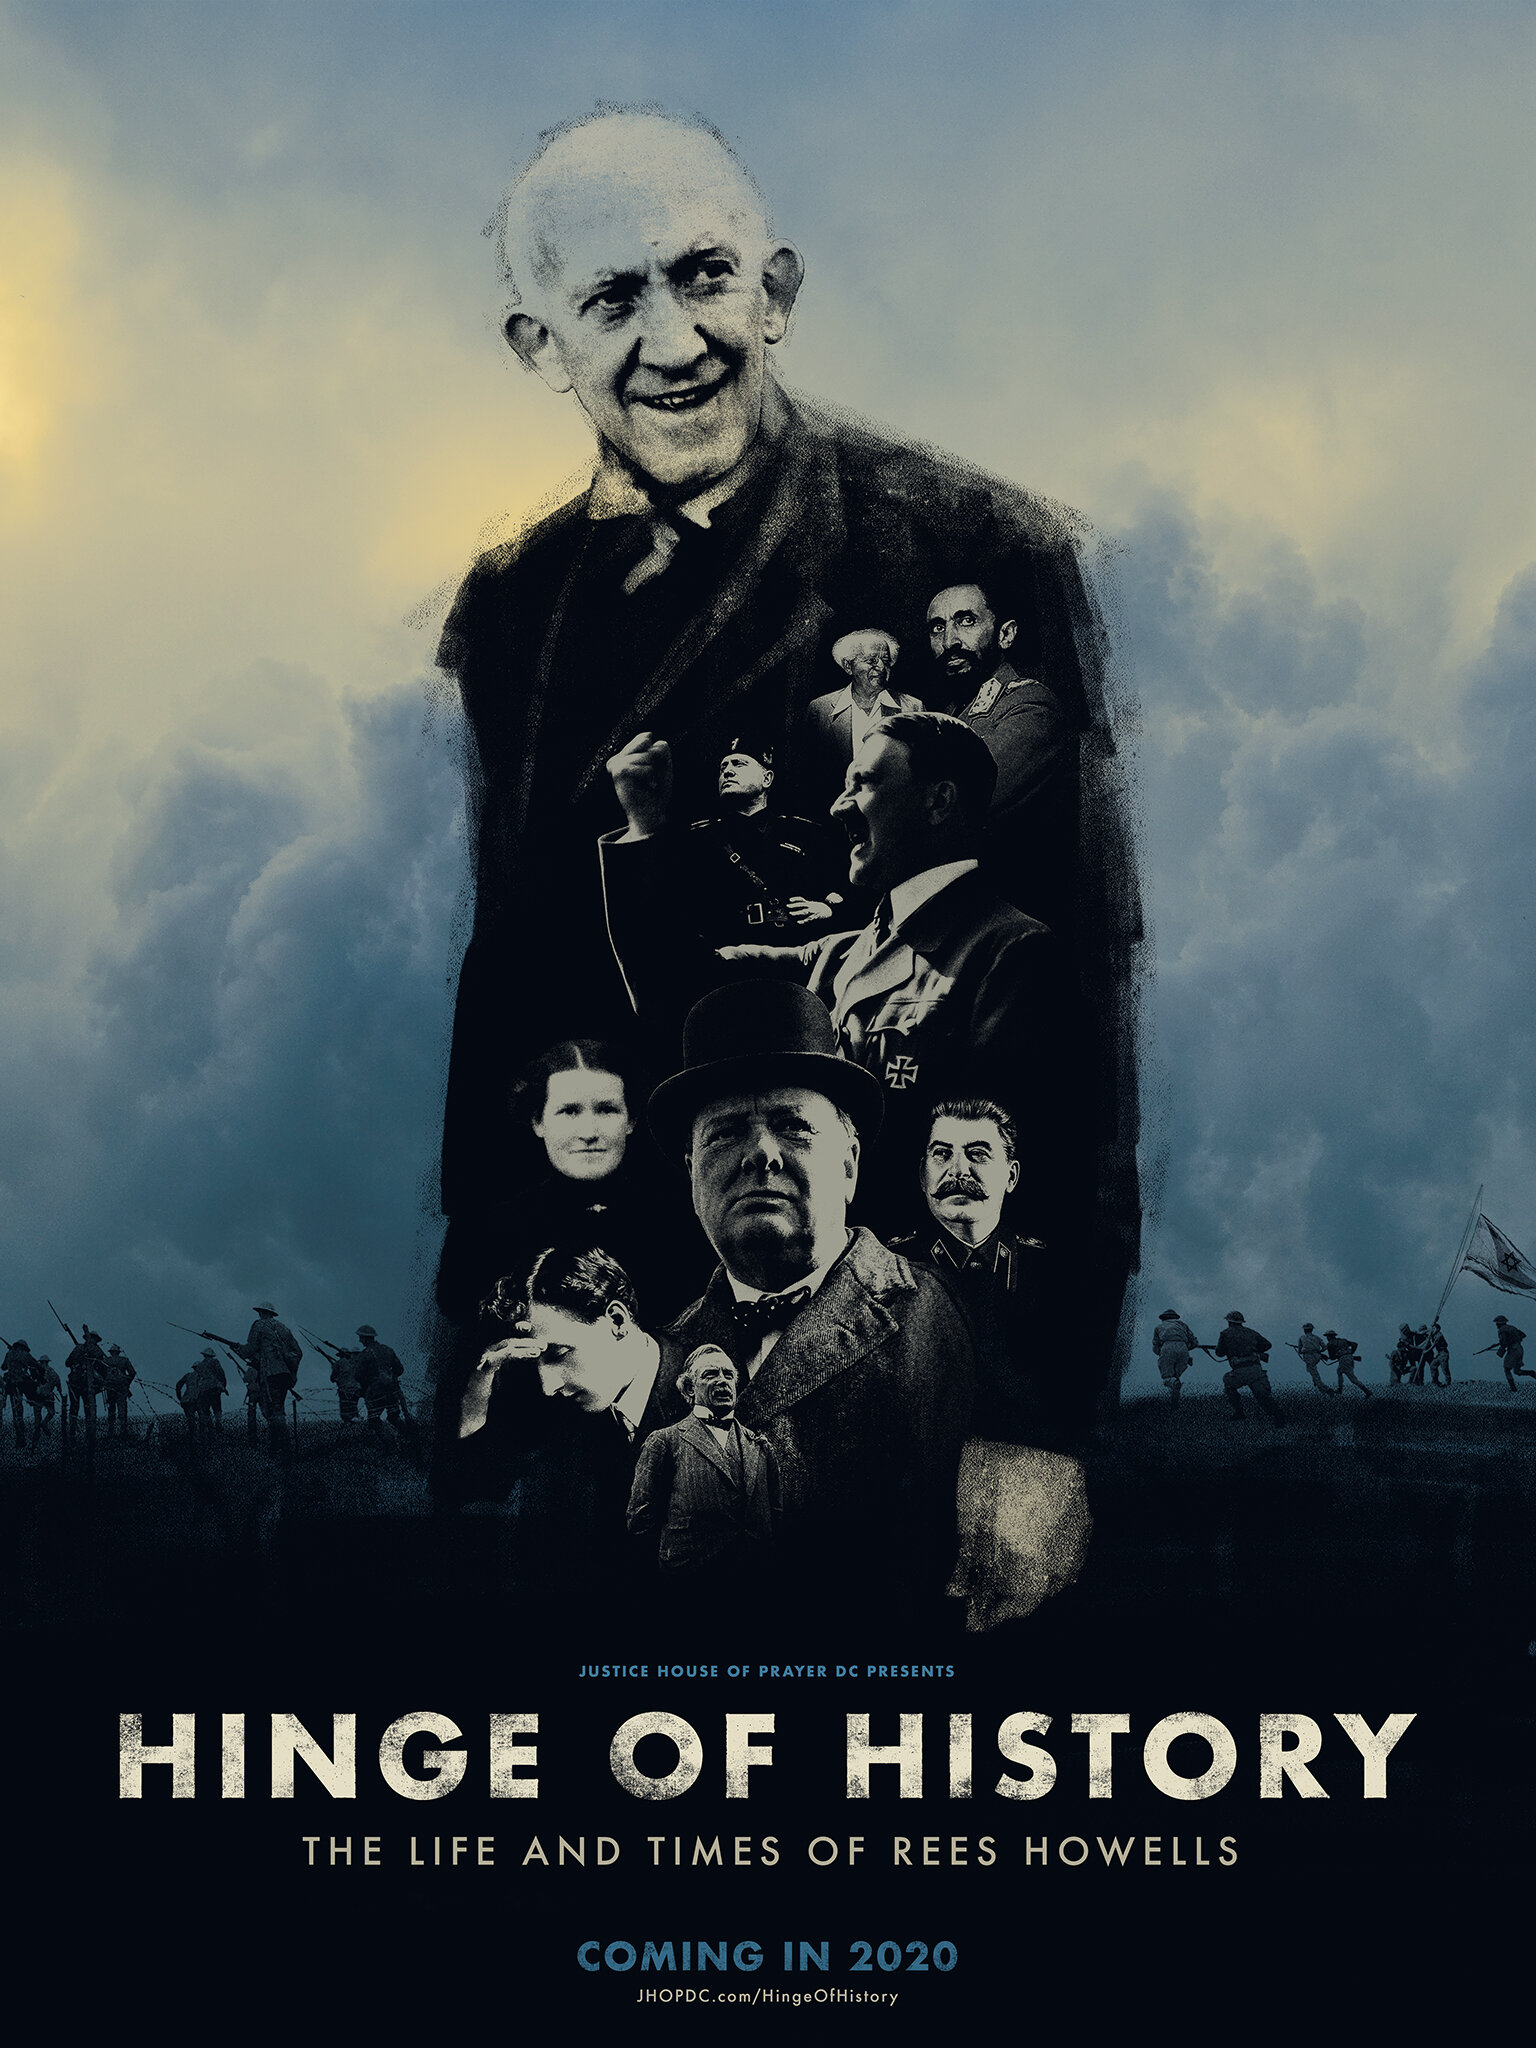 hinge-of-history-poster-1536x2048.jpg